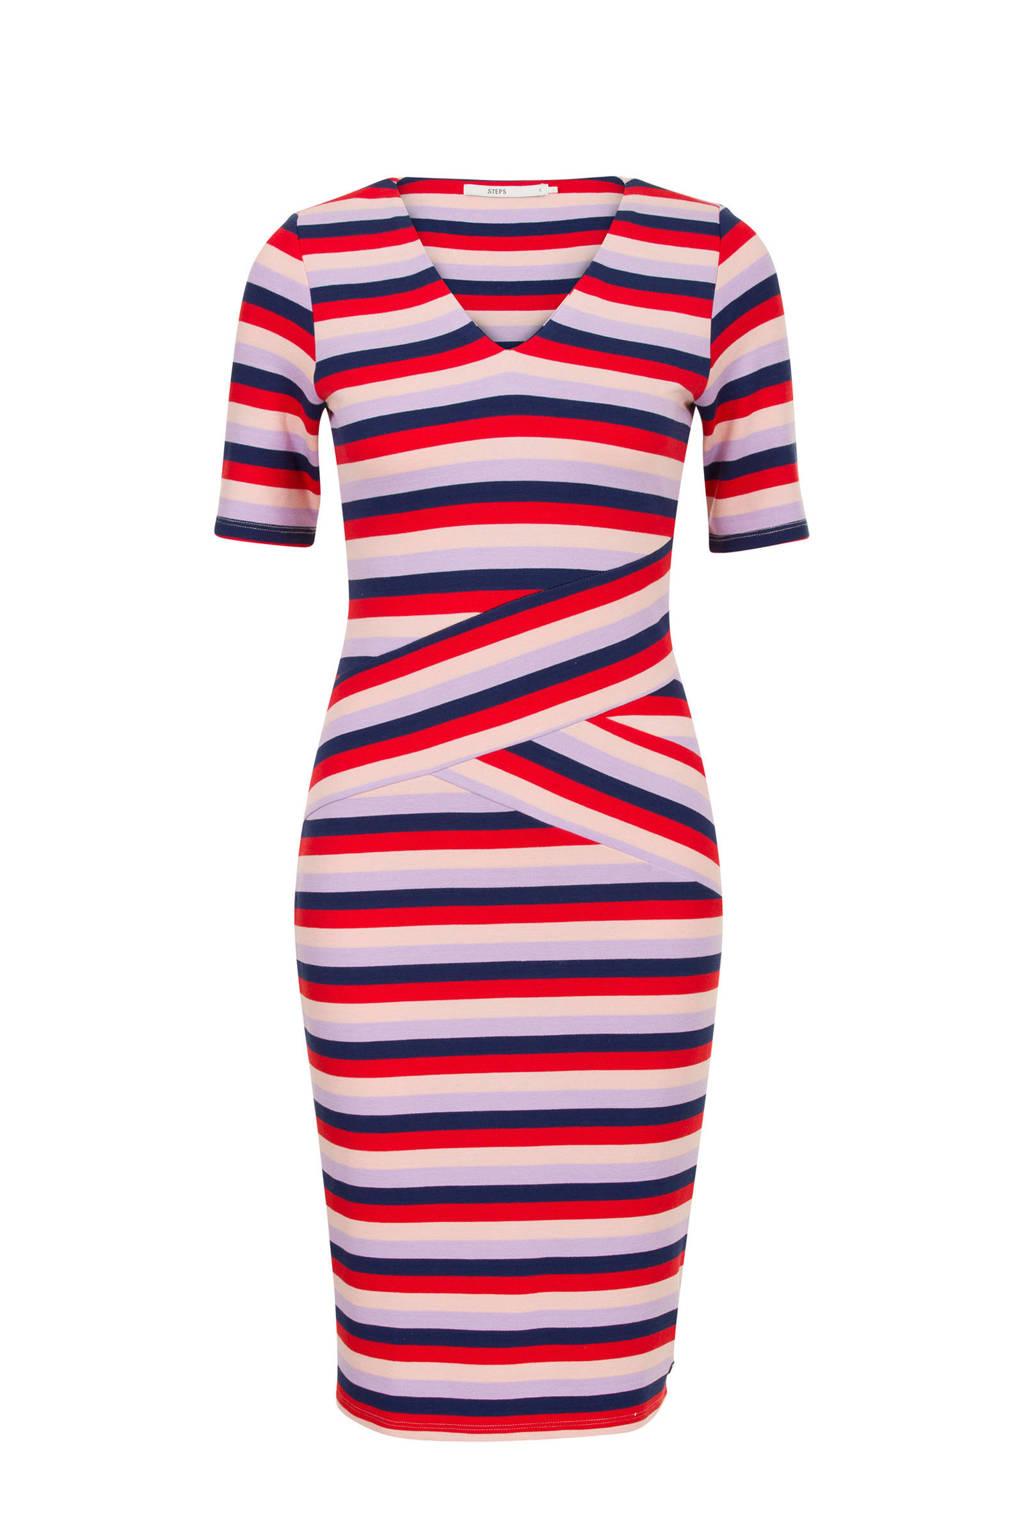 Steps jurk met strepen, Rood/blauw/roze